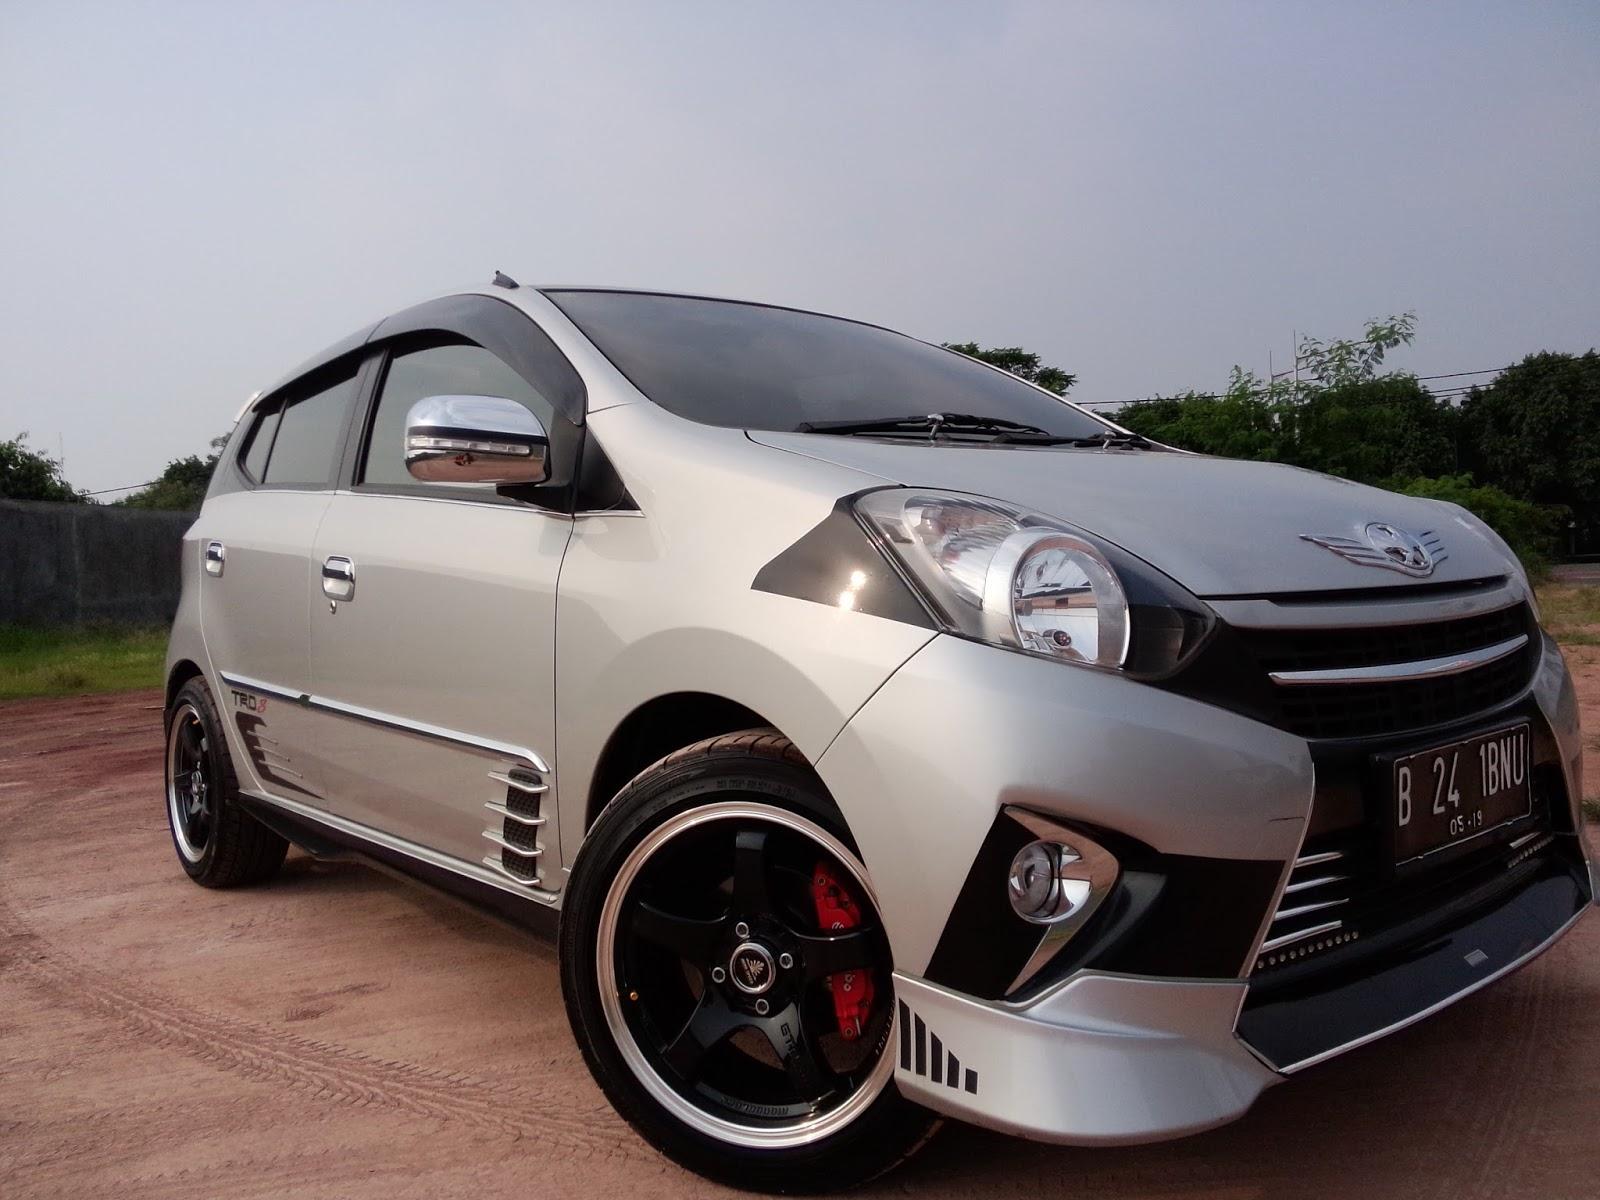 Gambar Toyota Agya Trd S A T Modifikasi Mobil